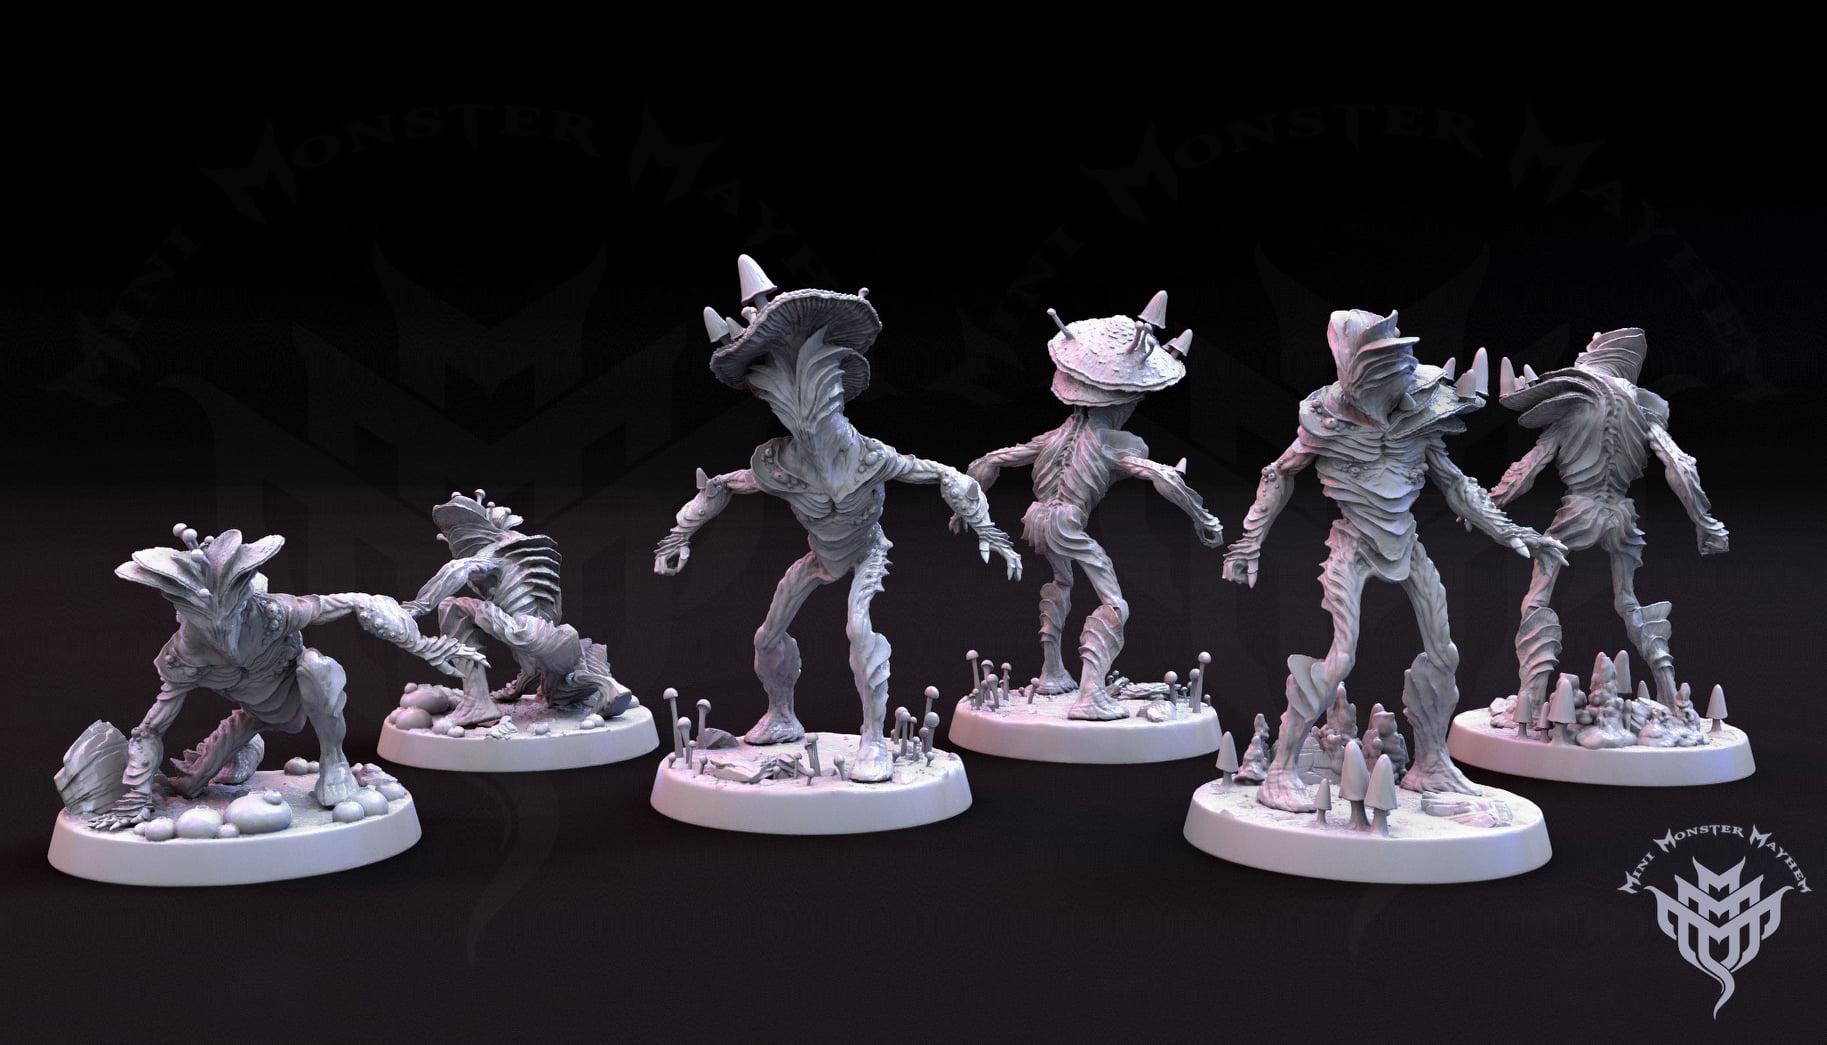 Mini Monster mayhem prints with AmeraLabs